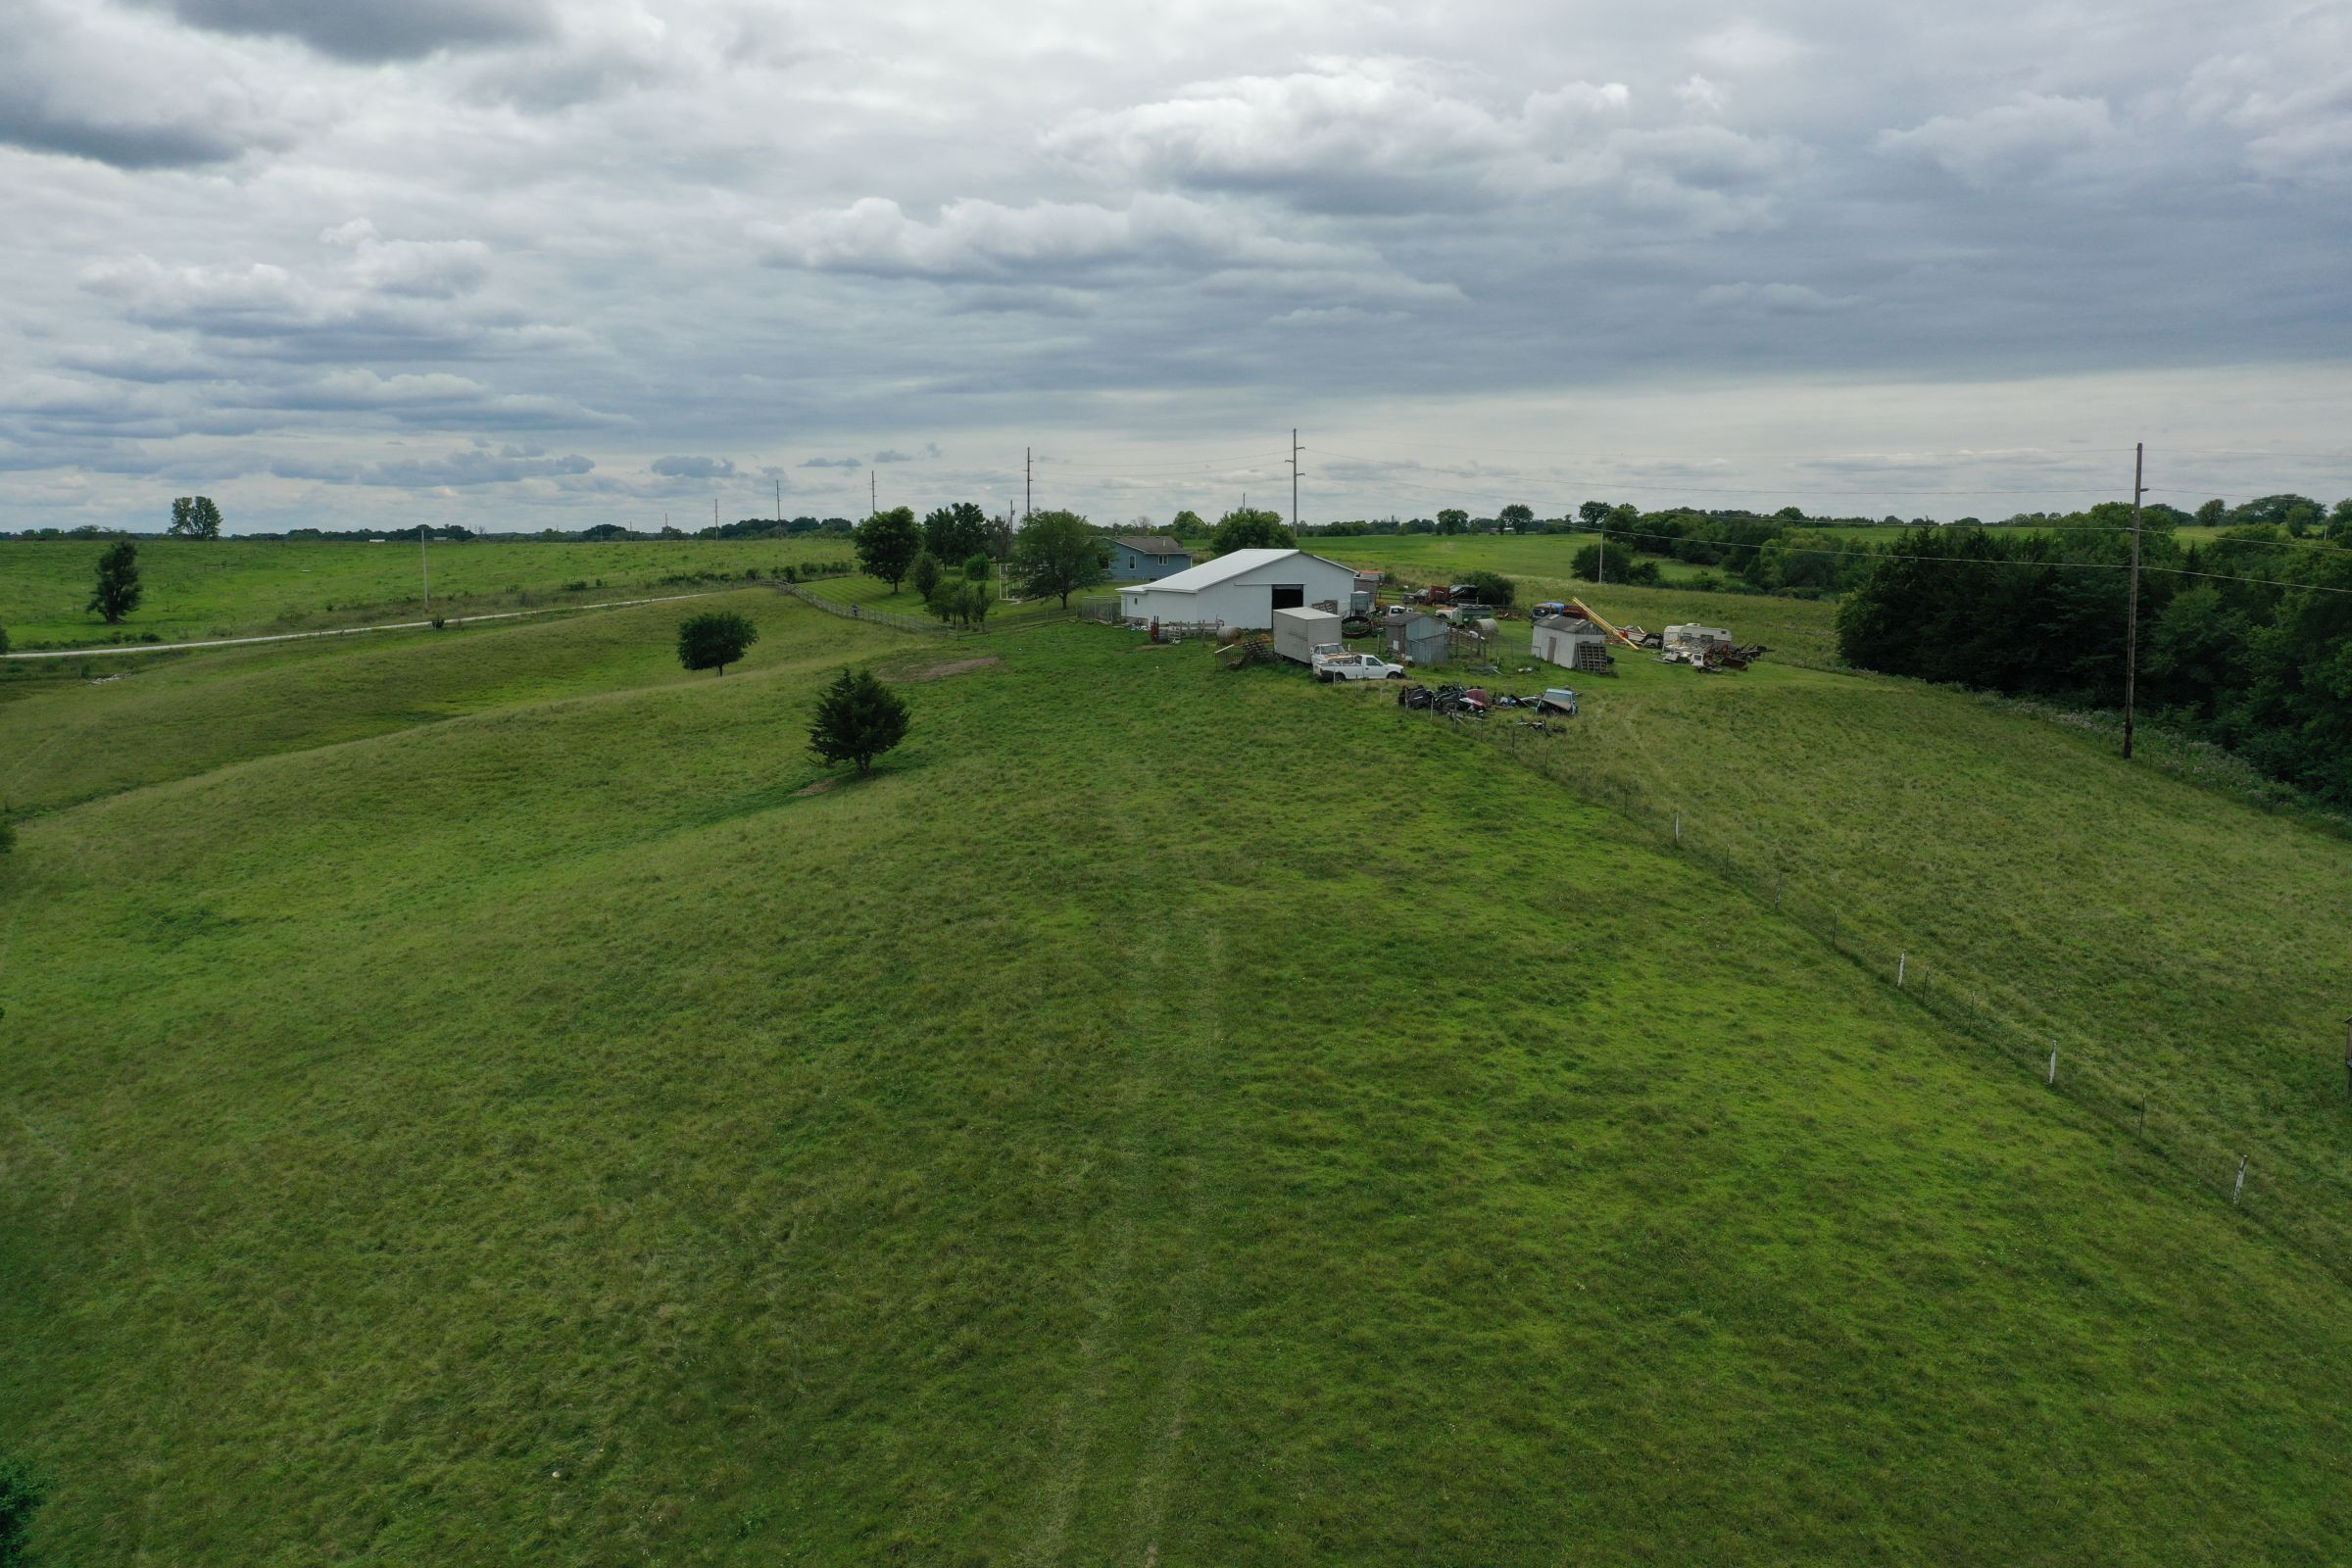 residential-warren-county-iowa-12-acres-listing-number-15104-2-2020-08-08-184615.jpg